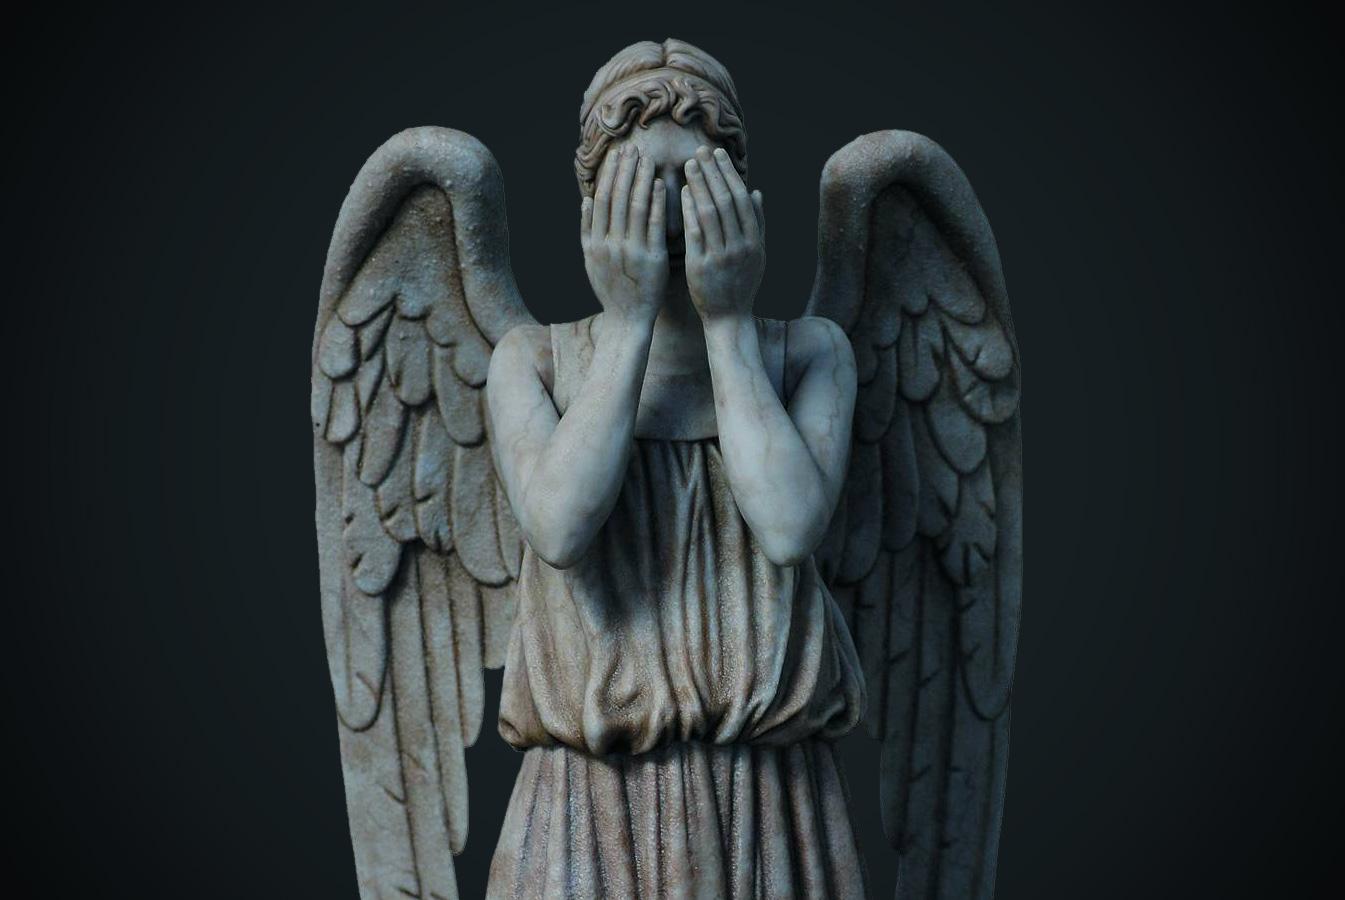 Weeping Angels Wallpaper HD   52DazheW Gallery 1345x900